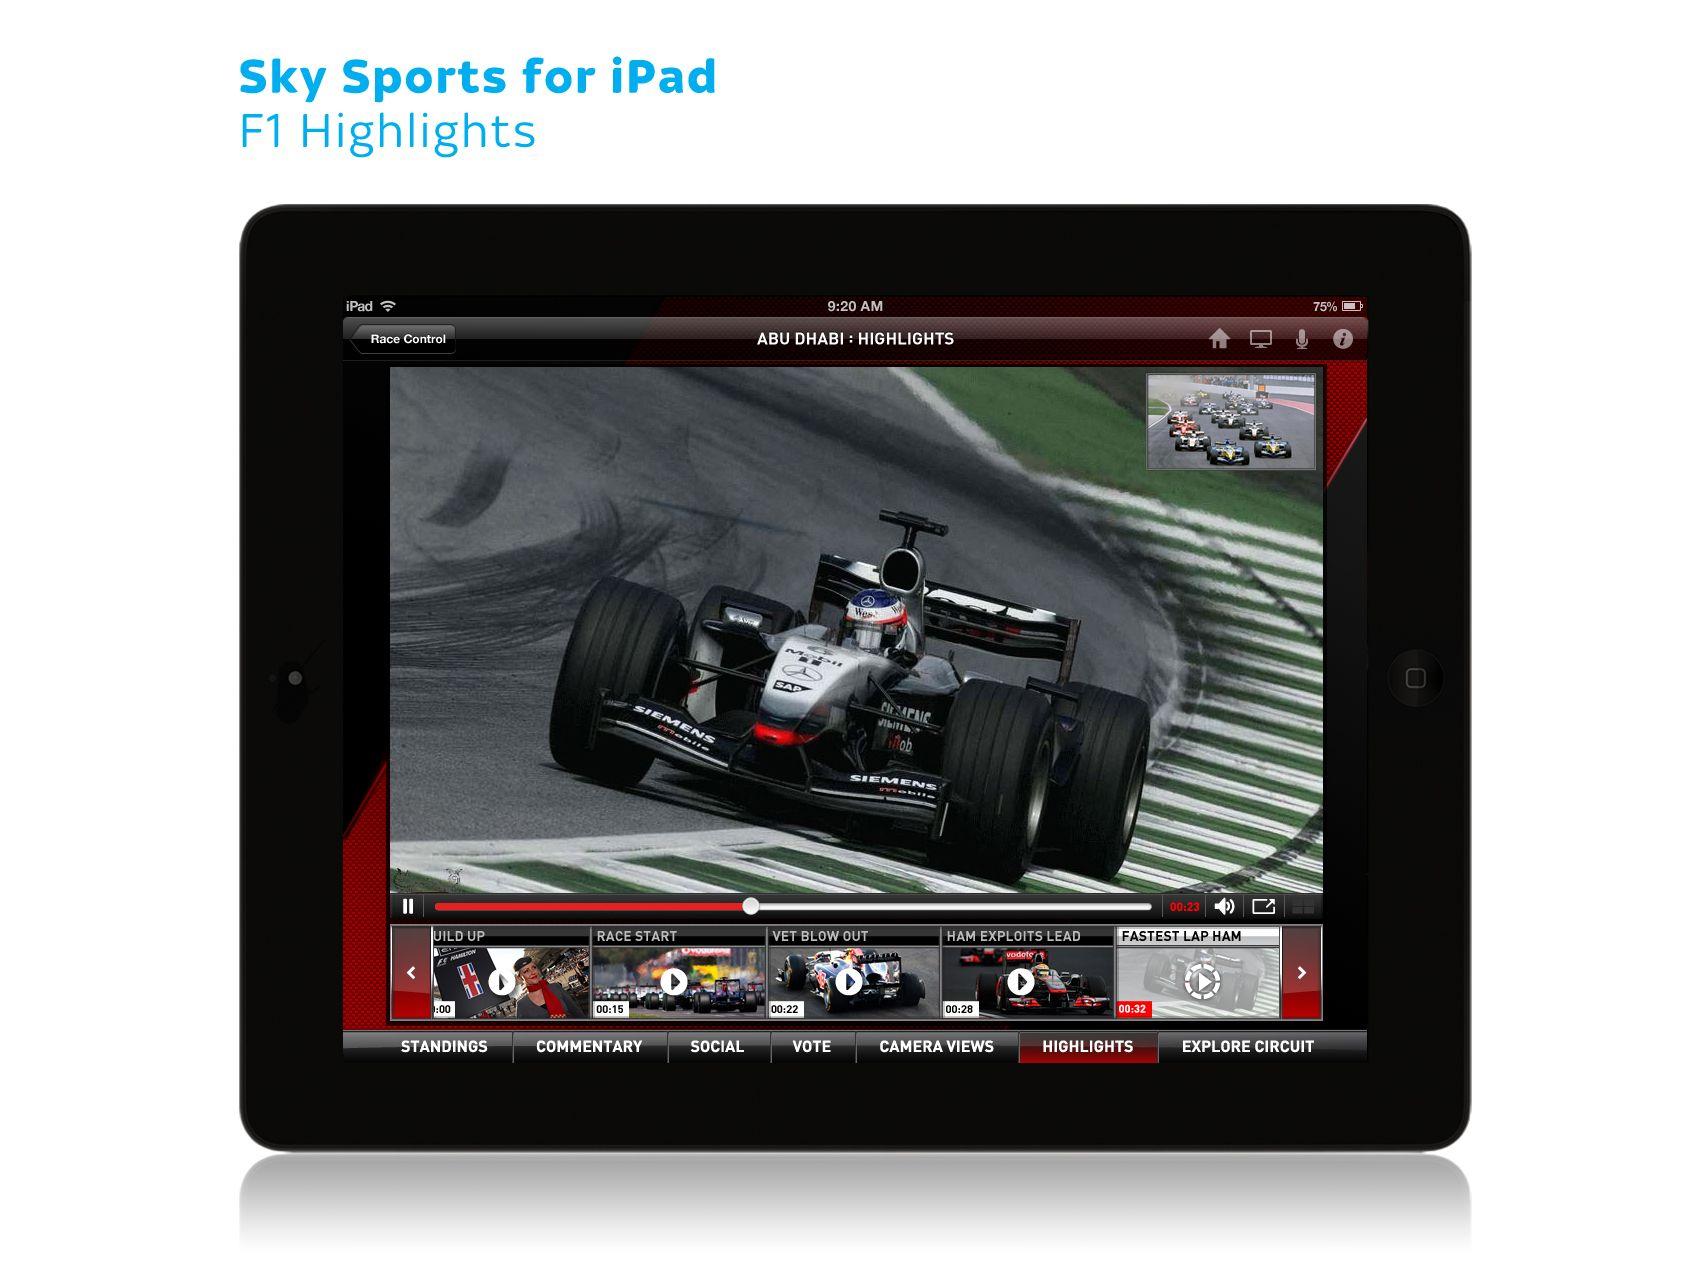 Sky Sports for iPad F1 05 Graphic card, Ipad, Sky